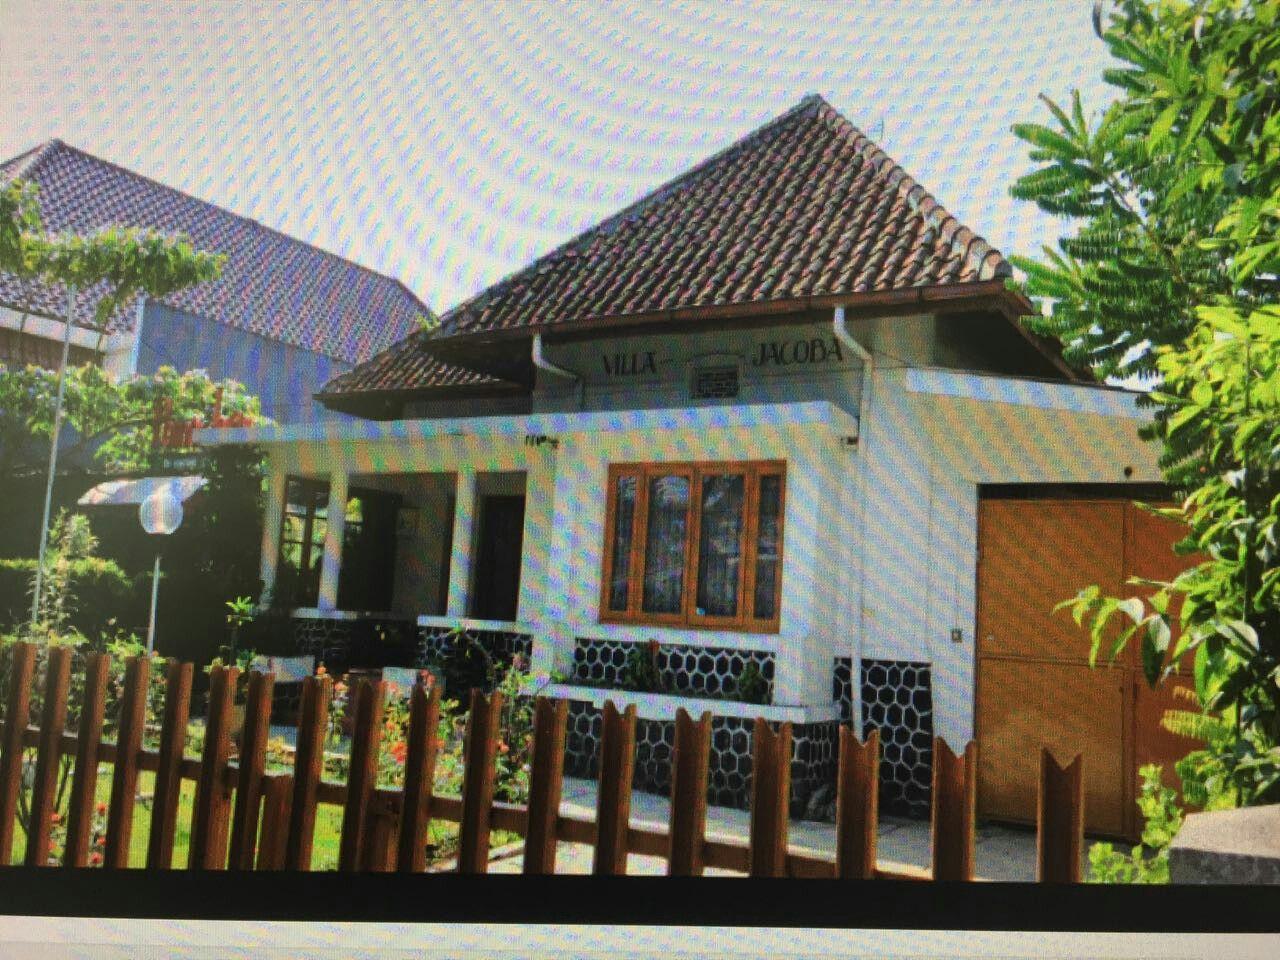 Desain Villa Jaman Kolonial Belanda & Desain Villa Jaman Kolonial Belanda | rumah belanda | Pinterest ...